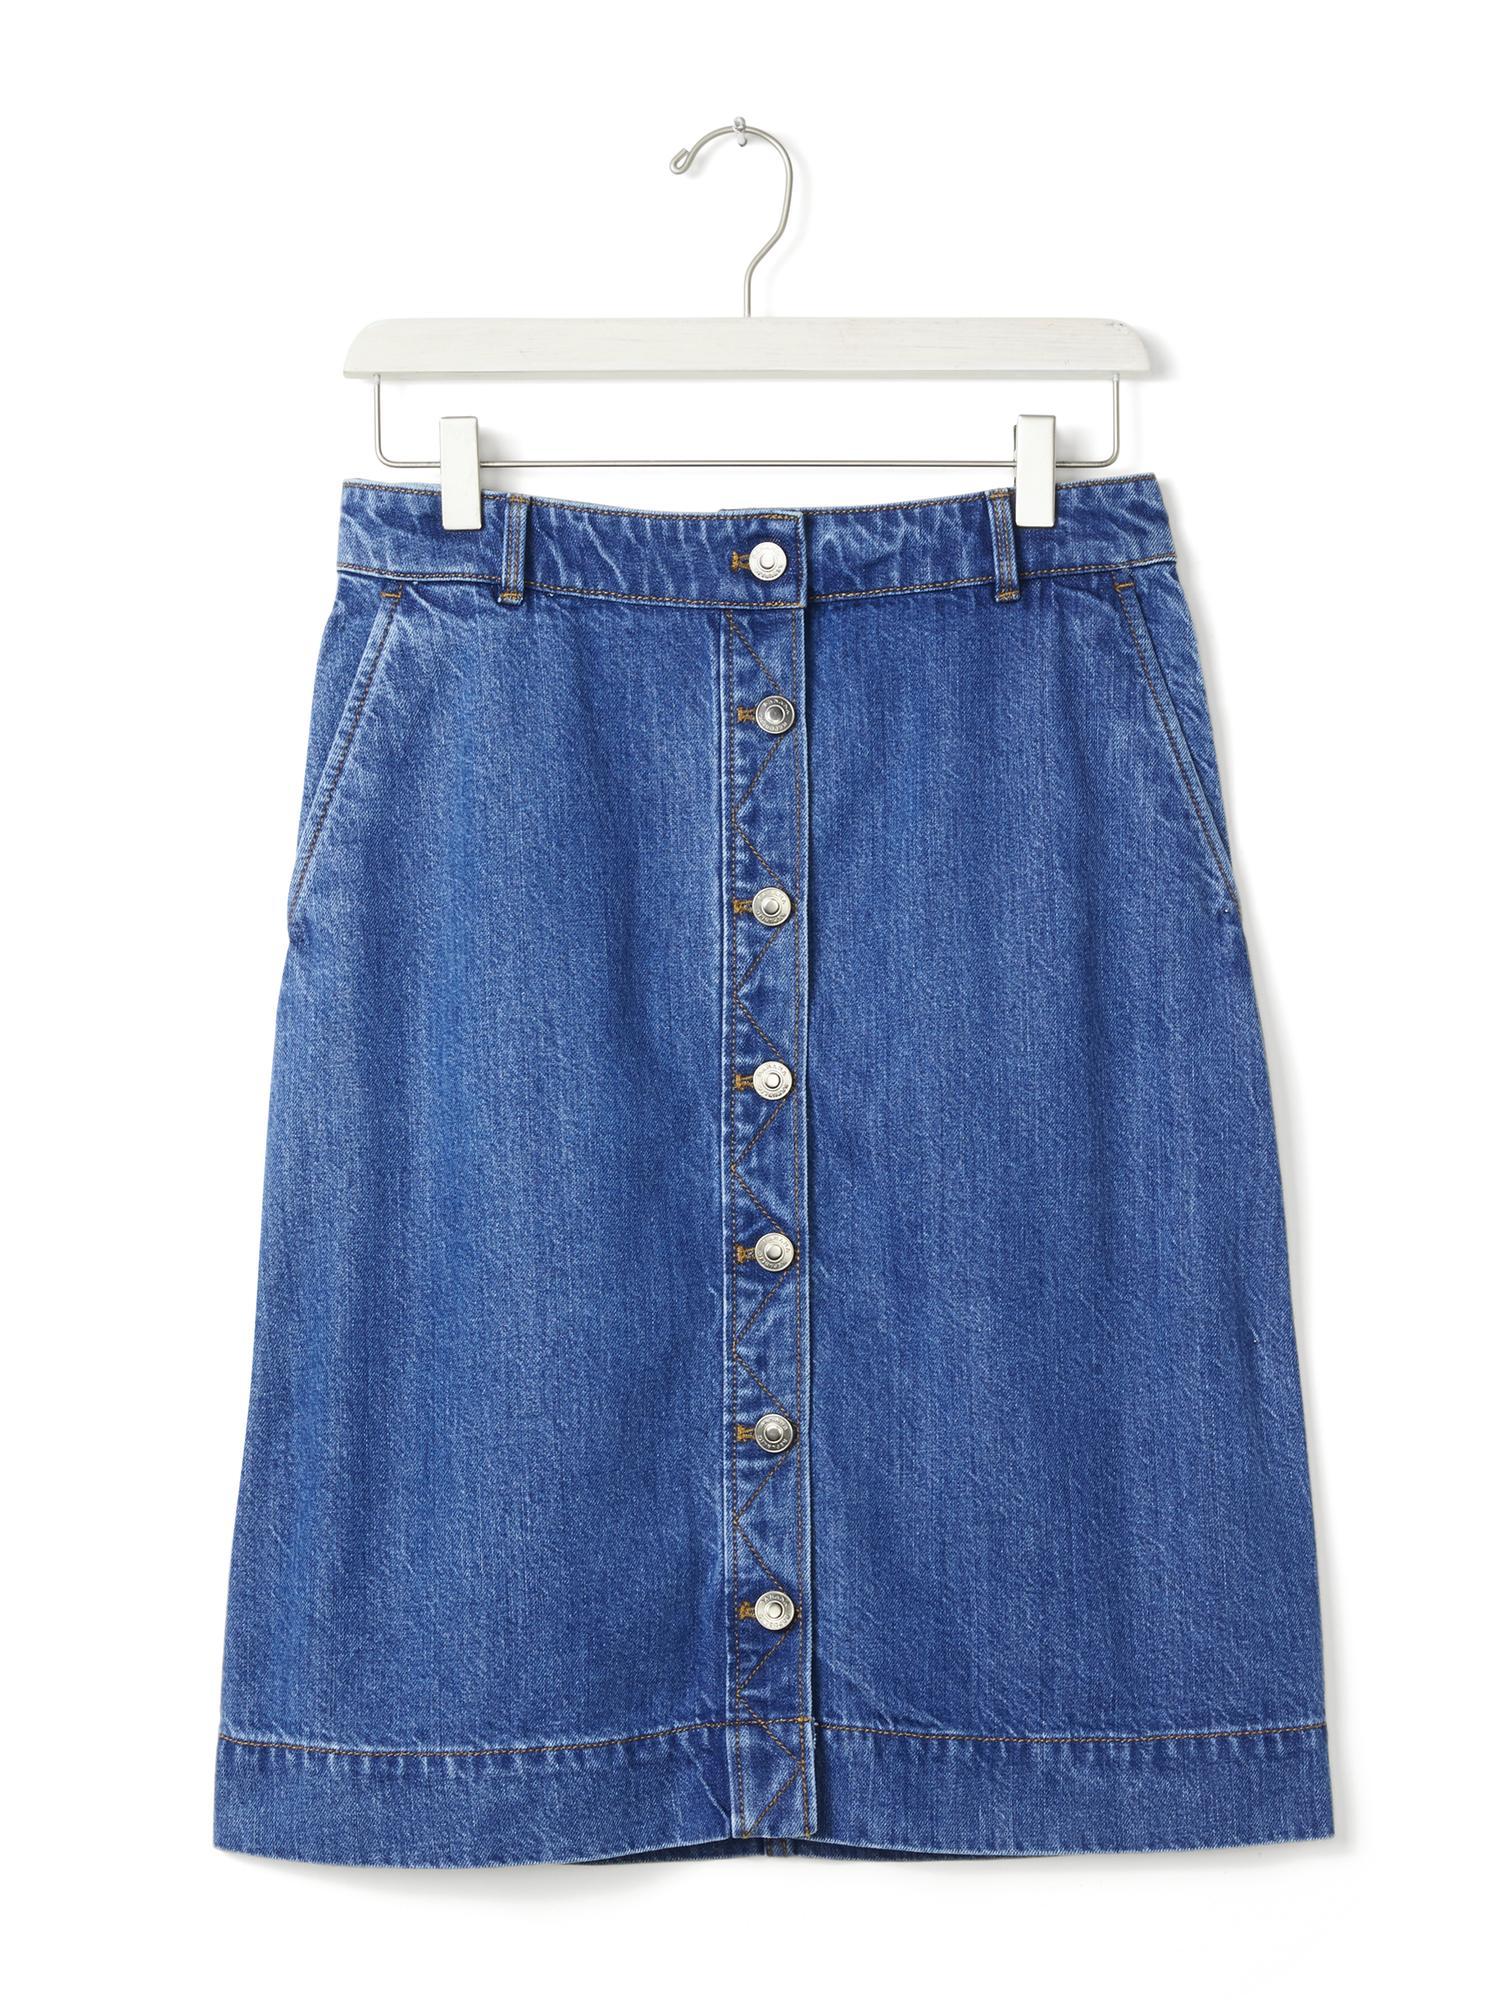 banana republic button front denim skirt in blue